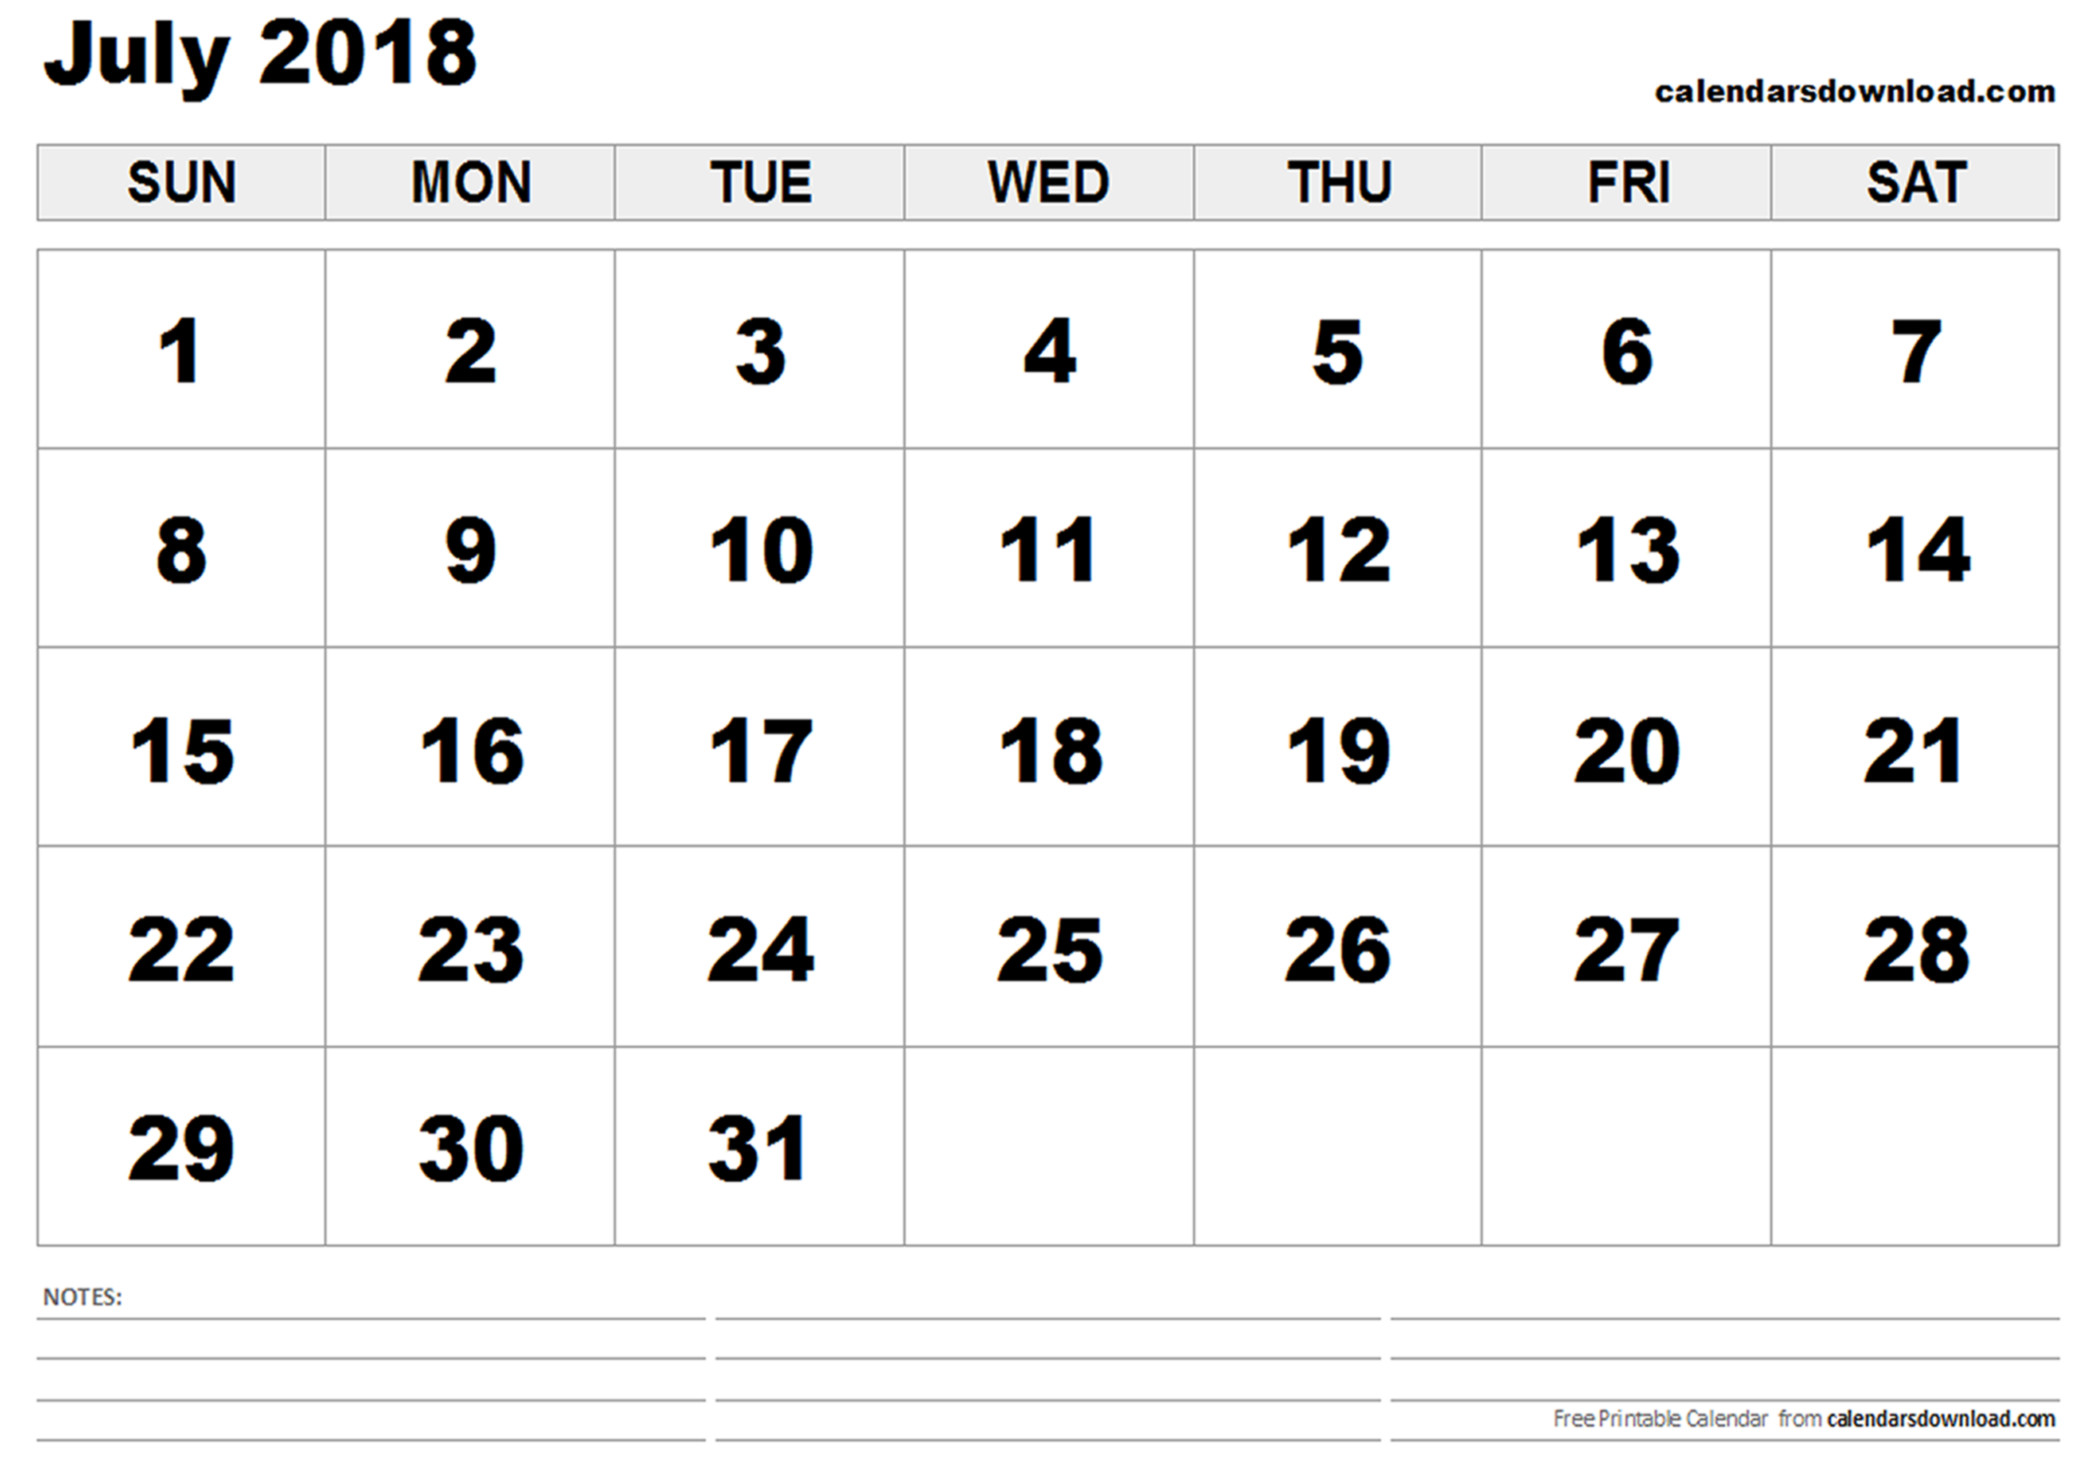 desktop wallpapers calendar july 2018